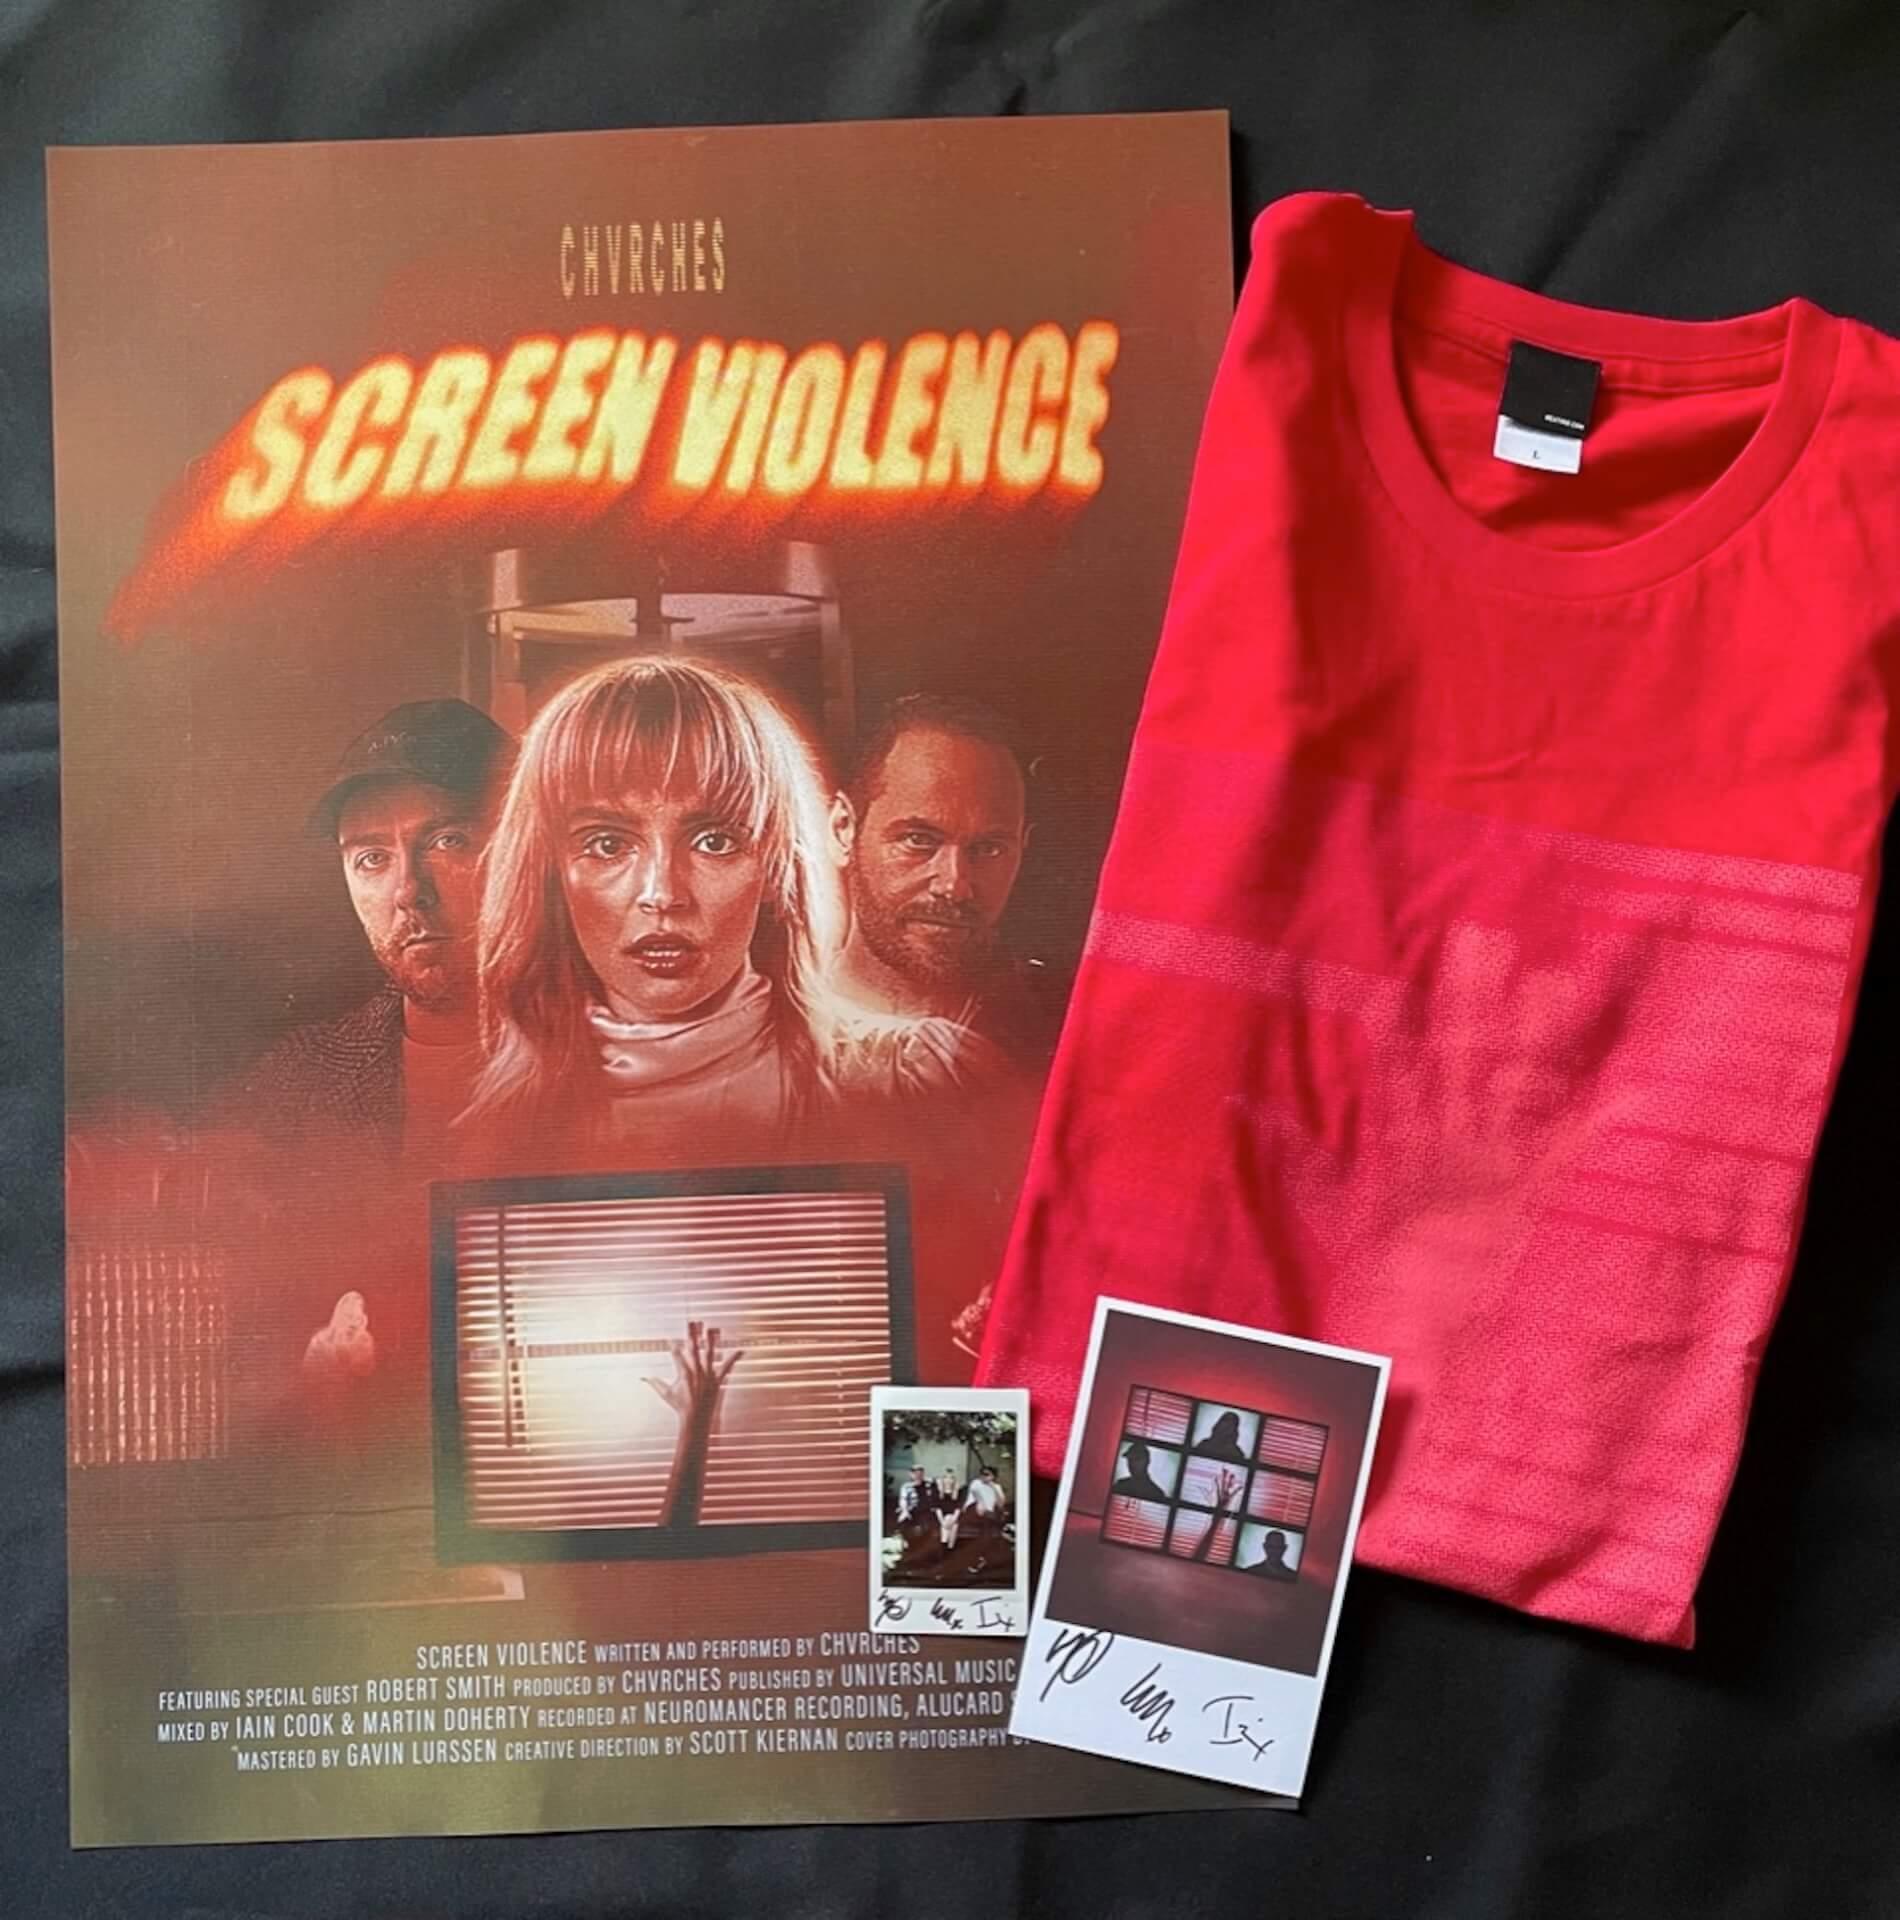 CHVRCHES最新アルバム『Screen Violence』発売記念!タワレコでサイン入り豪華特典が当たるキャンペーン実施決定 music210824_chvrches_14